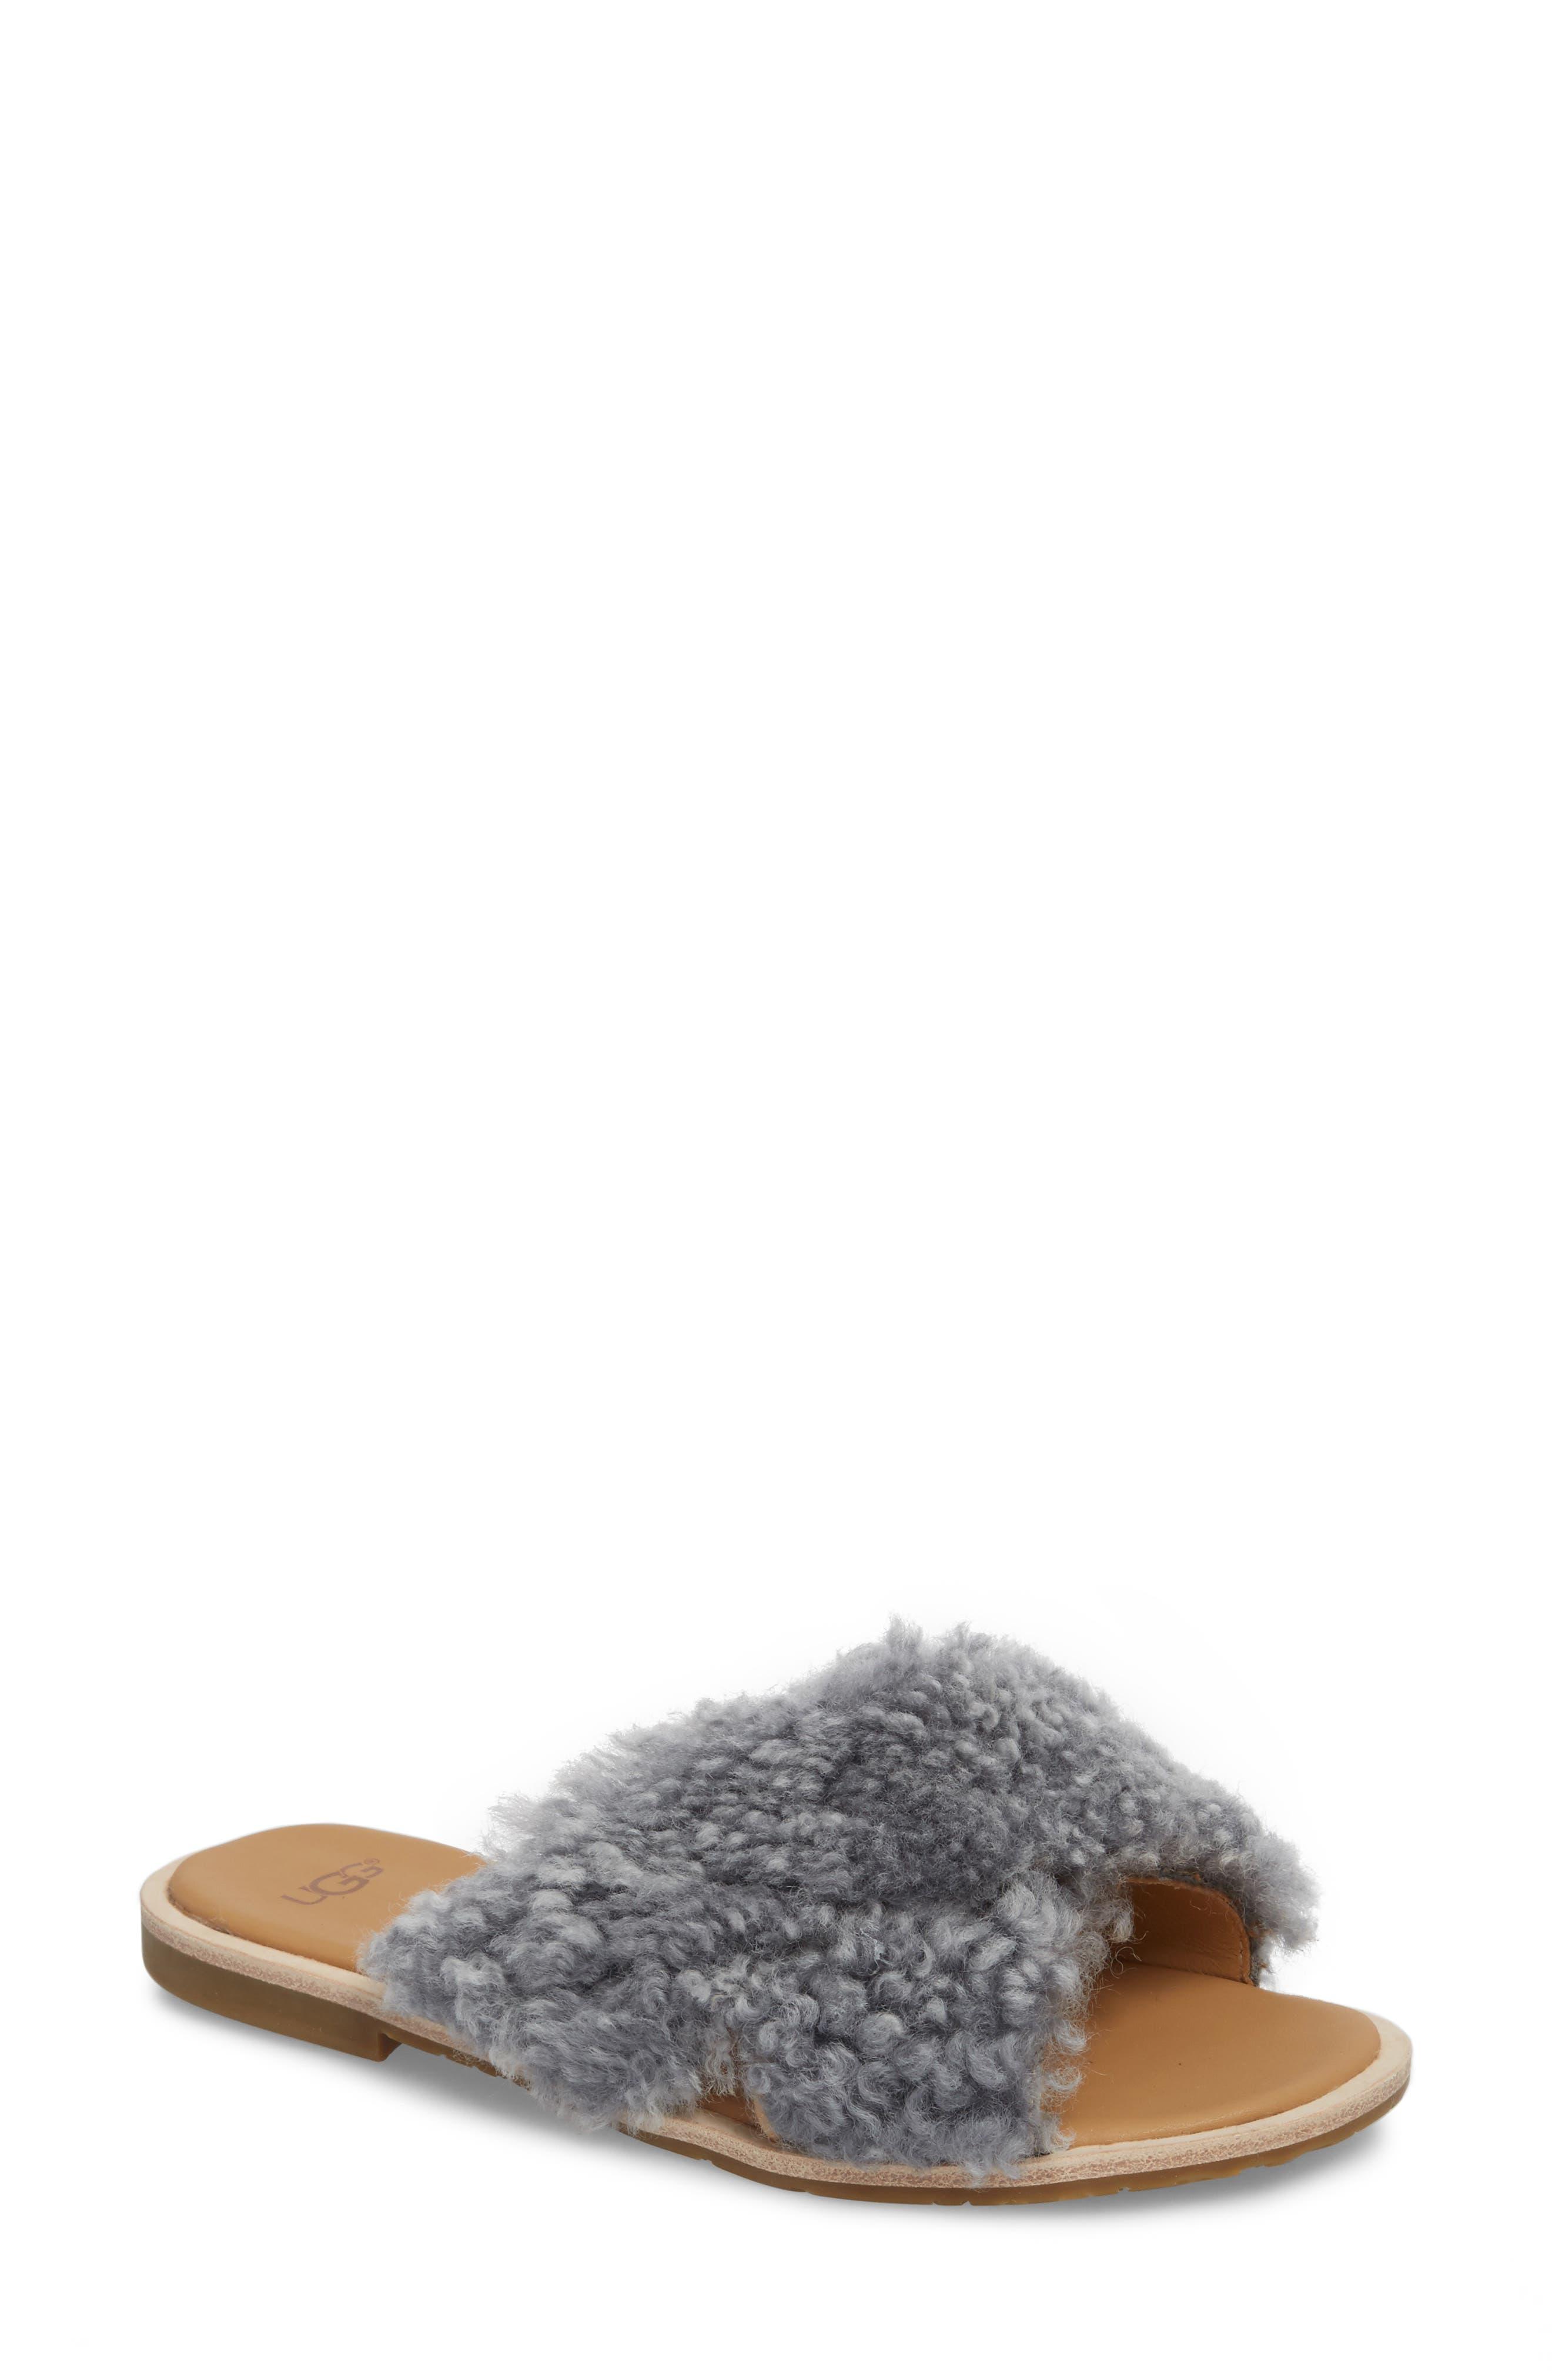 Joni Genuine Shearling Slide Sandal,                         Main,                         color, LUDE GREY